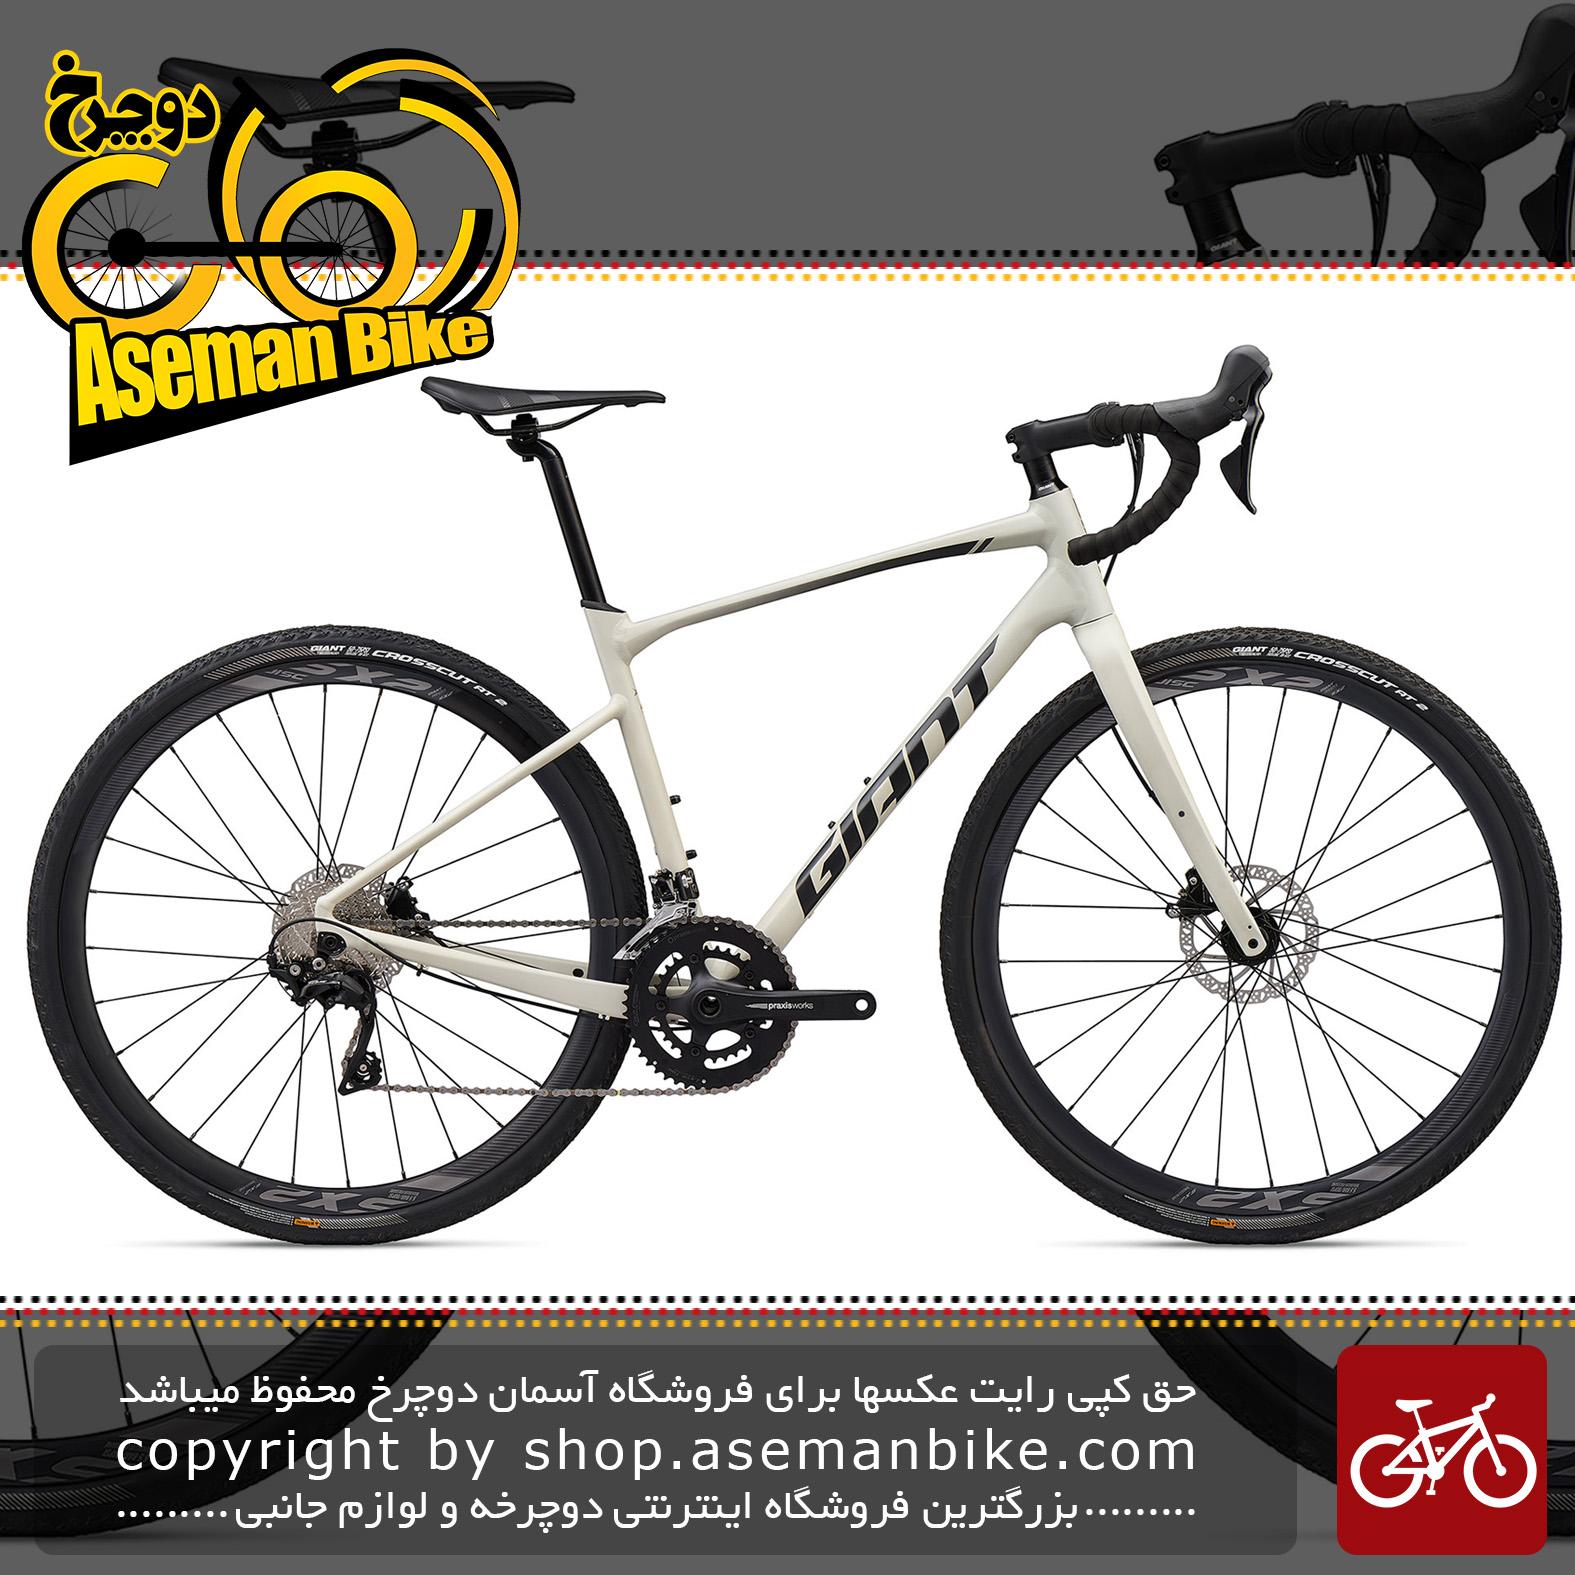 دوچرخه دومنظوره جاینت مدل ریولت 0 2020 Giant Gravel Bicycle Revolt 0 2020